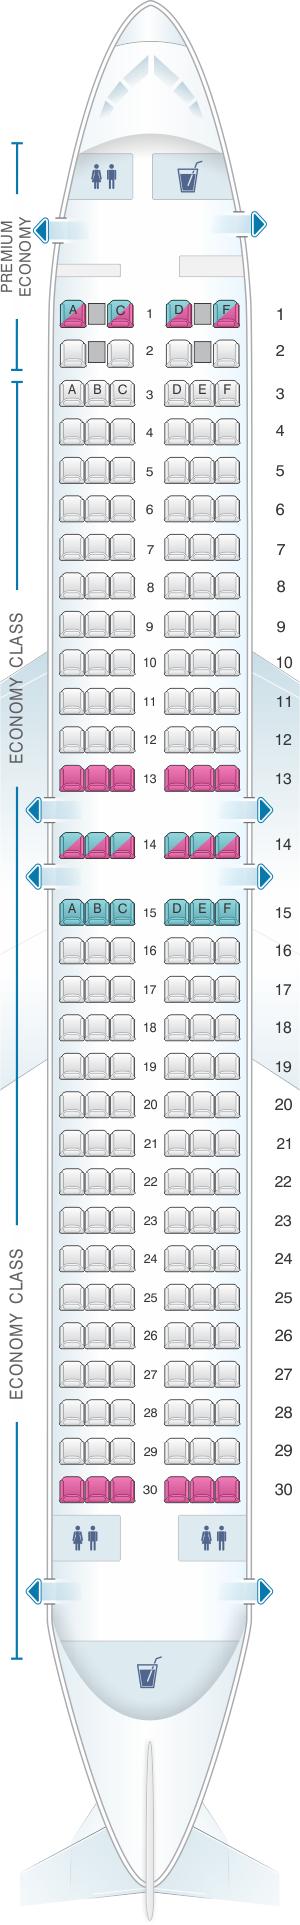 Seat map for Virgin Australia Boeing B737 800 Premium Economy